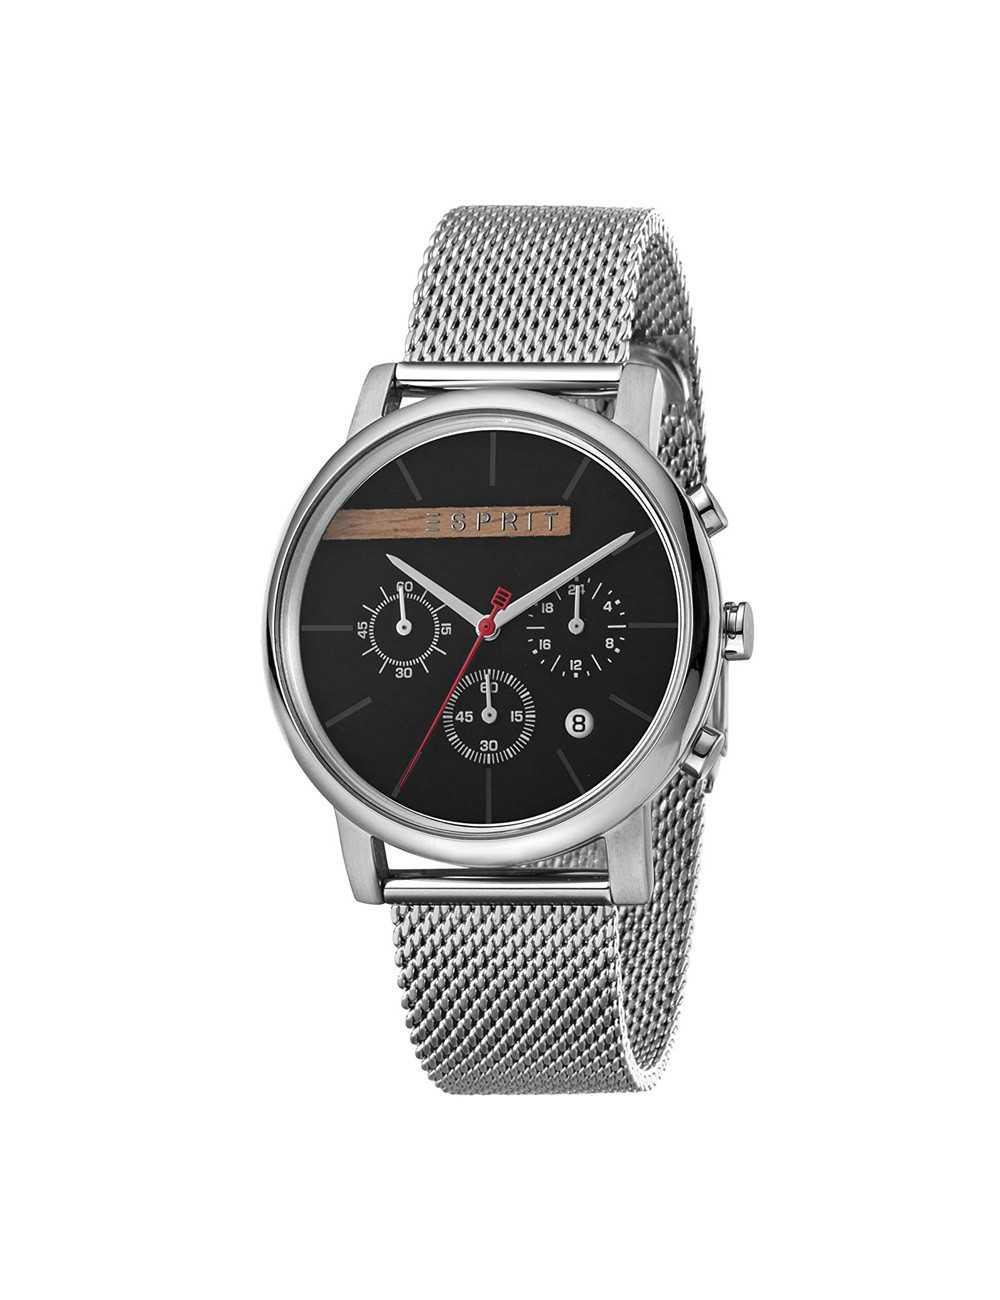 Pánske hodinky chronografu Esprit ES1G040M0045 Vision Black Mesh